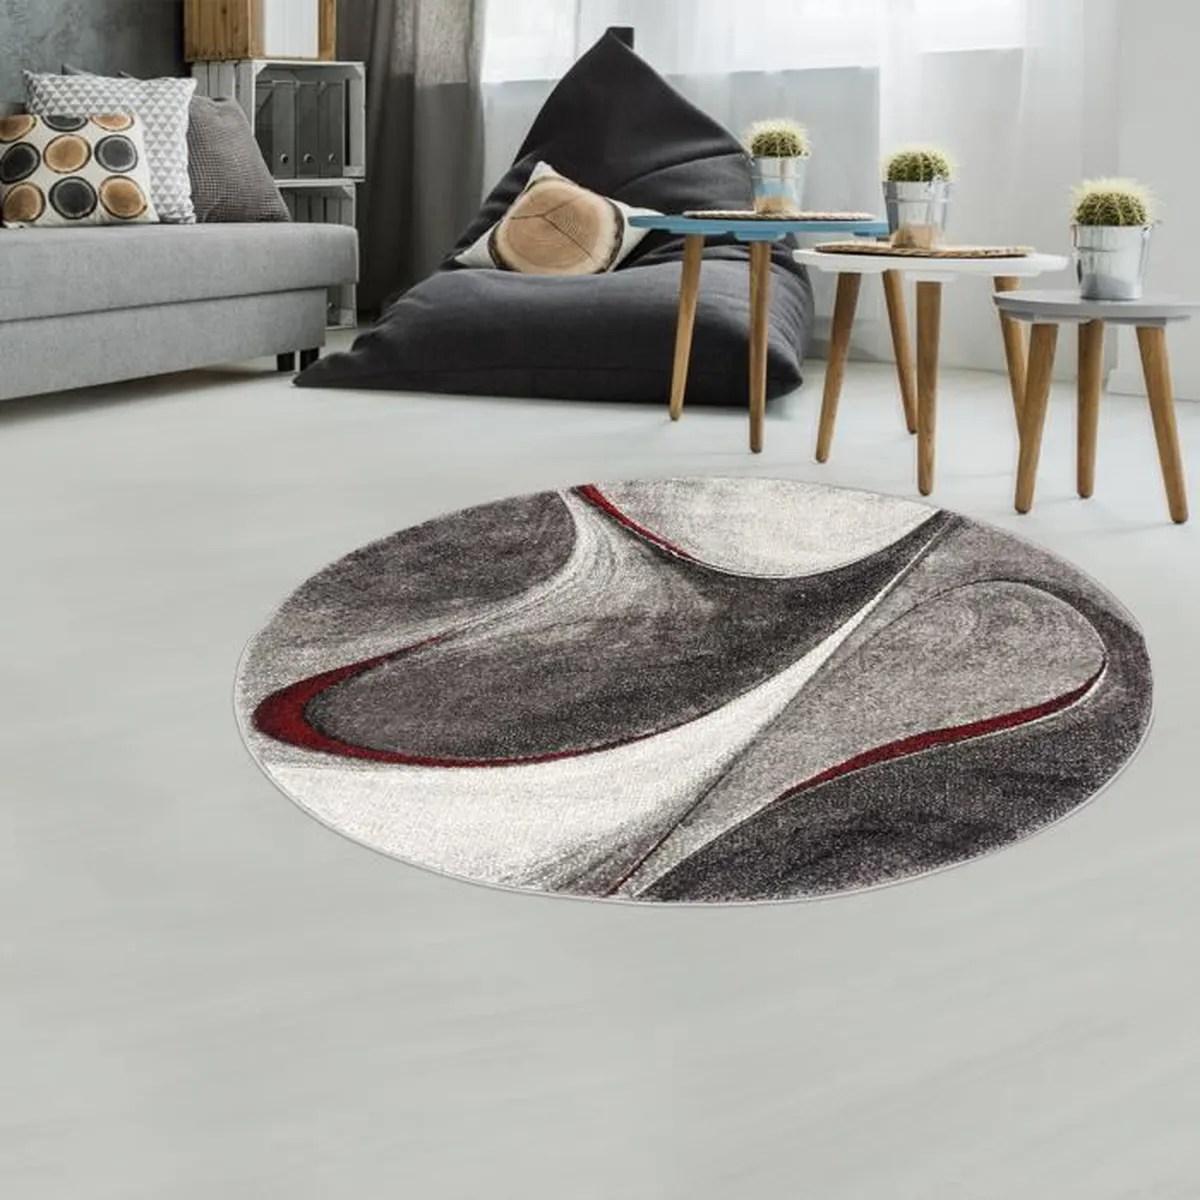 tapis rond 200 cm